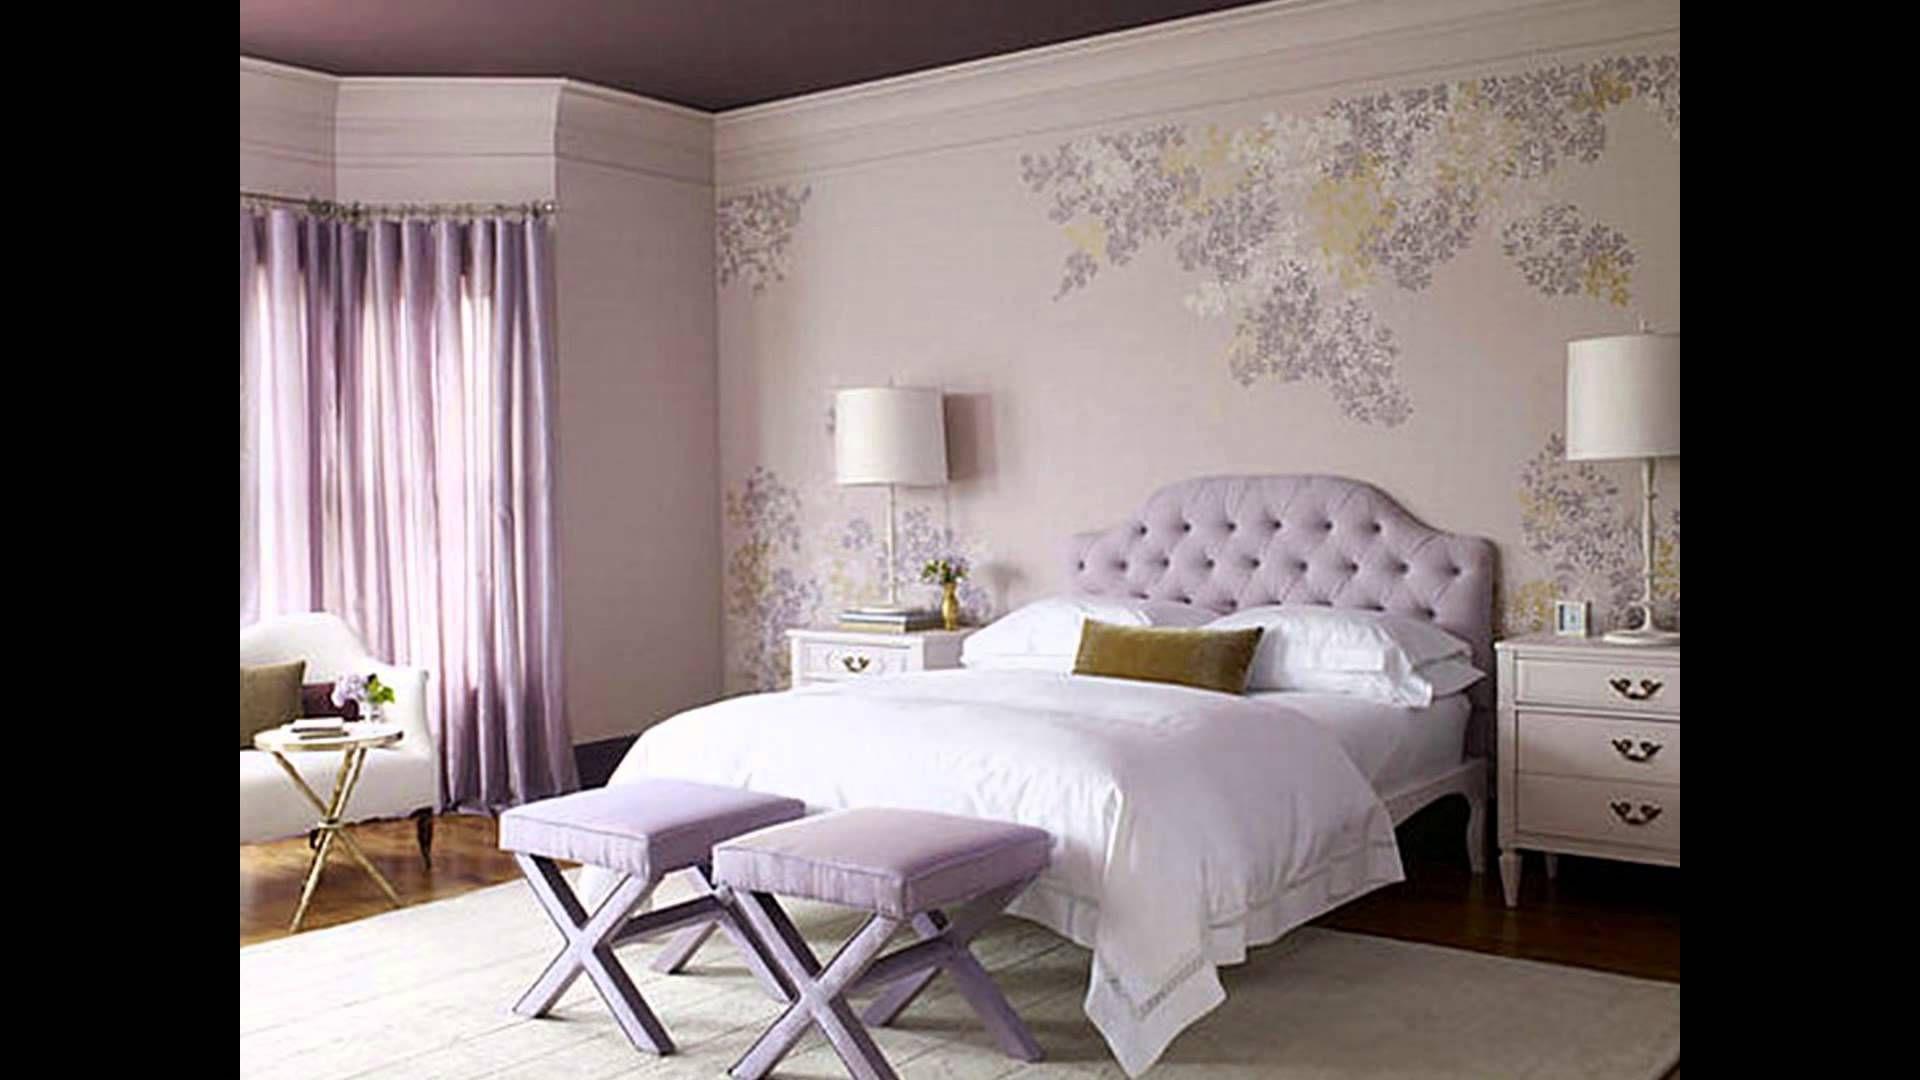 Elegant Bedroom Decorating Ideas Budget Living Room Design On A